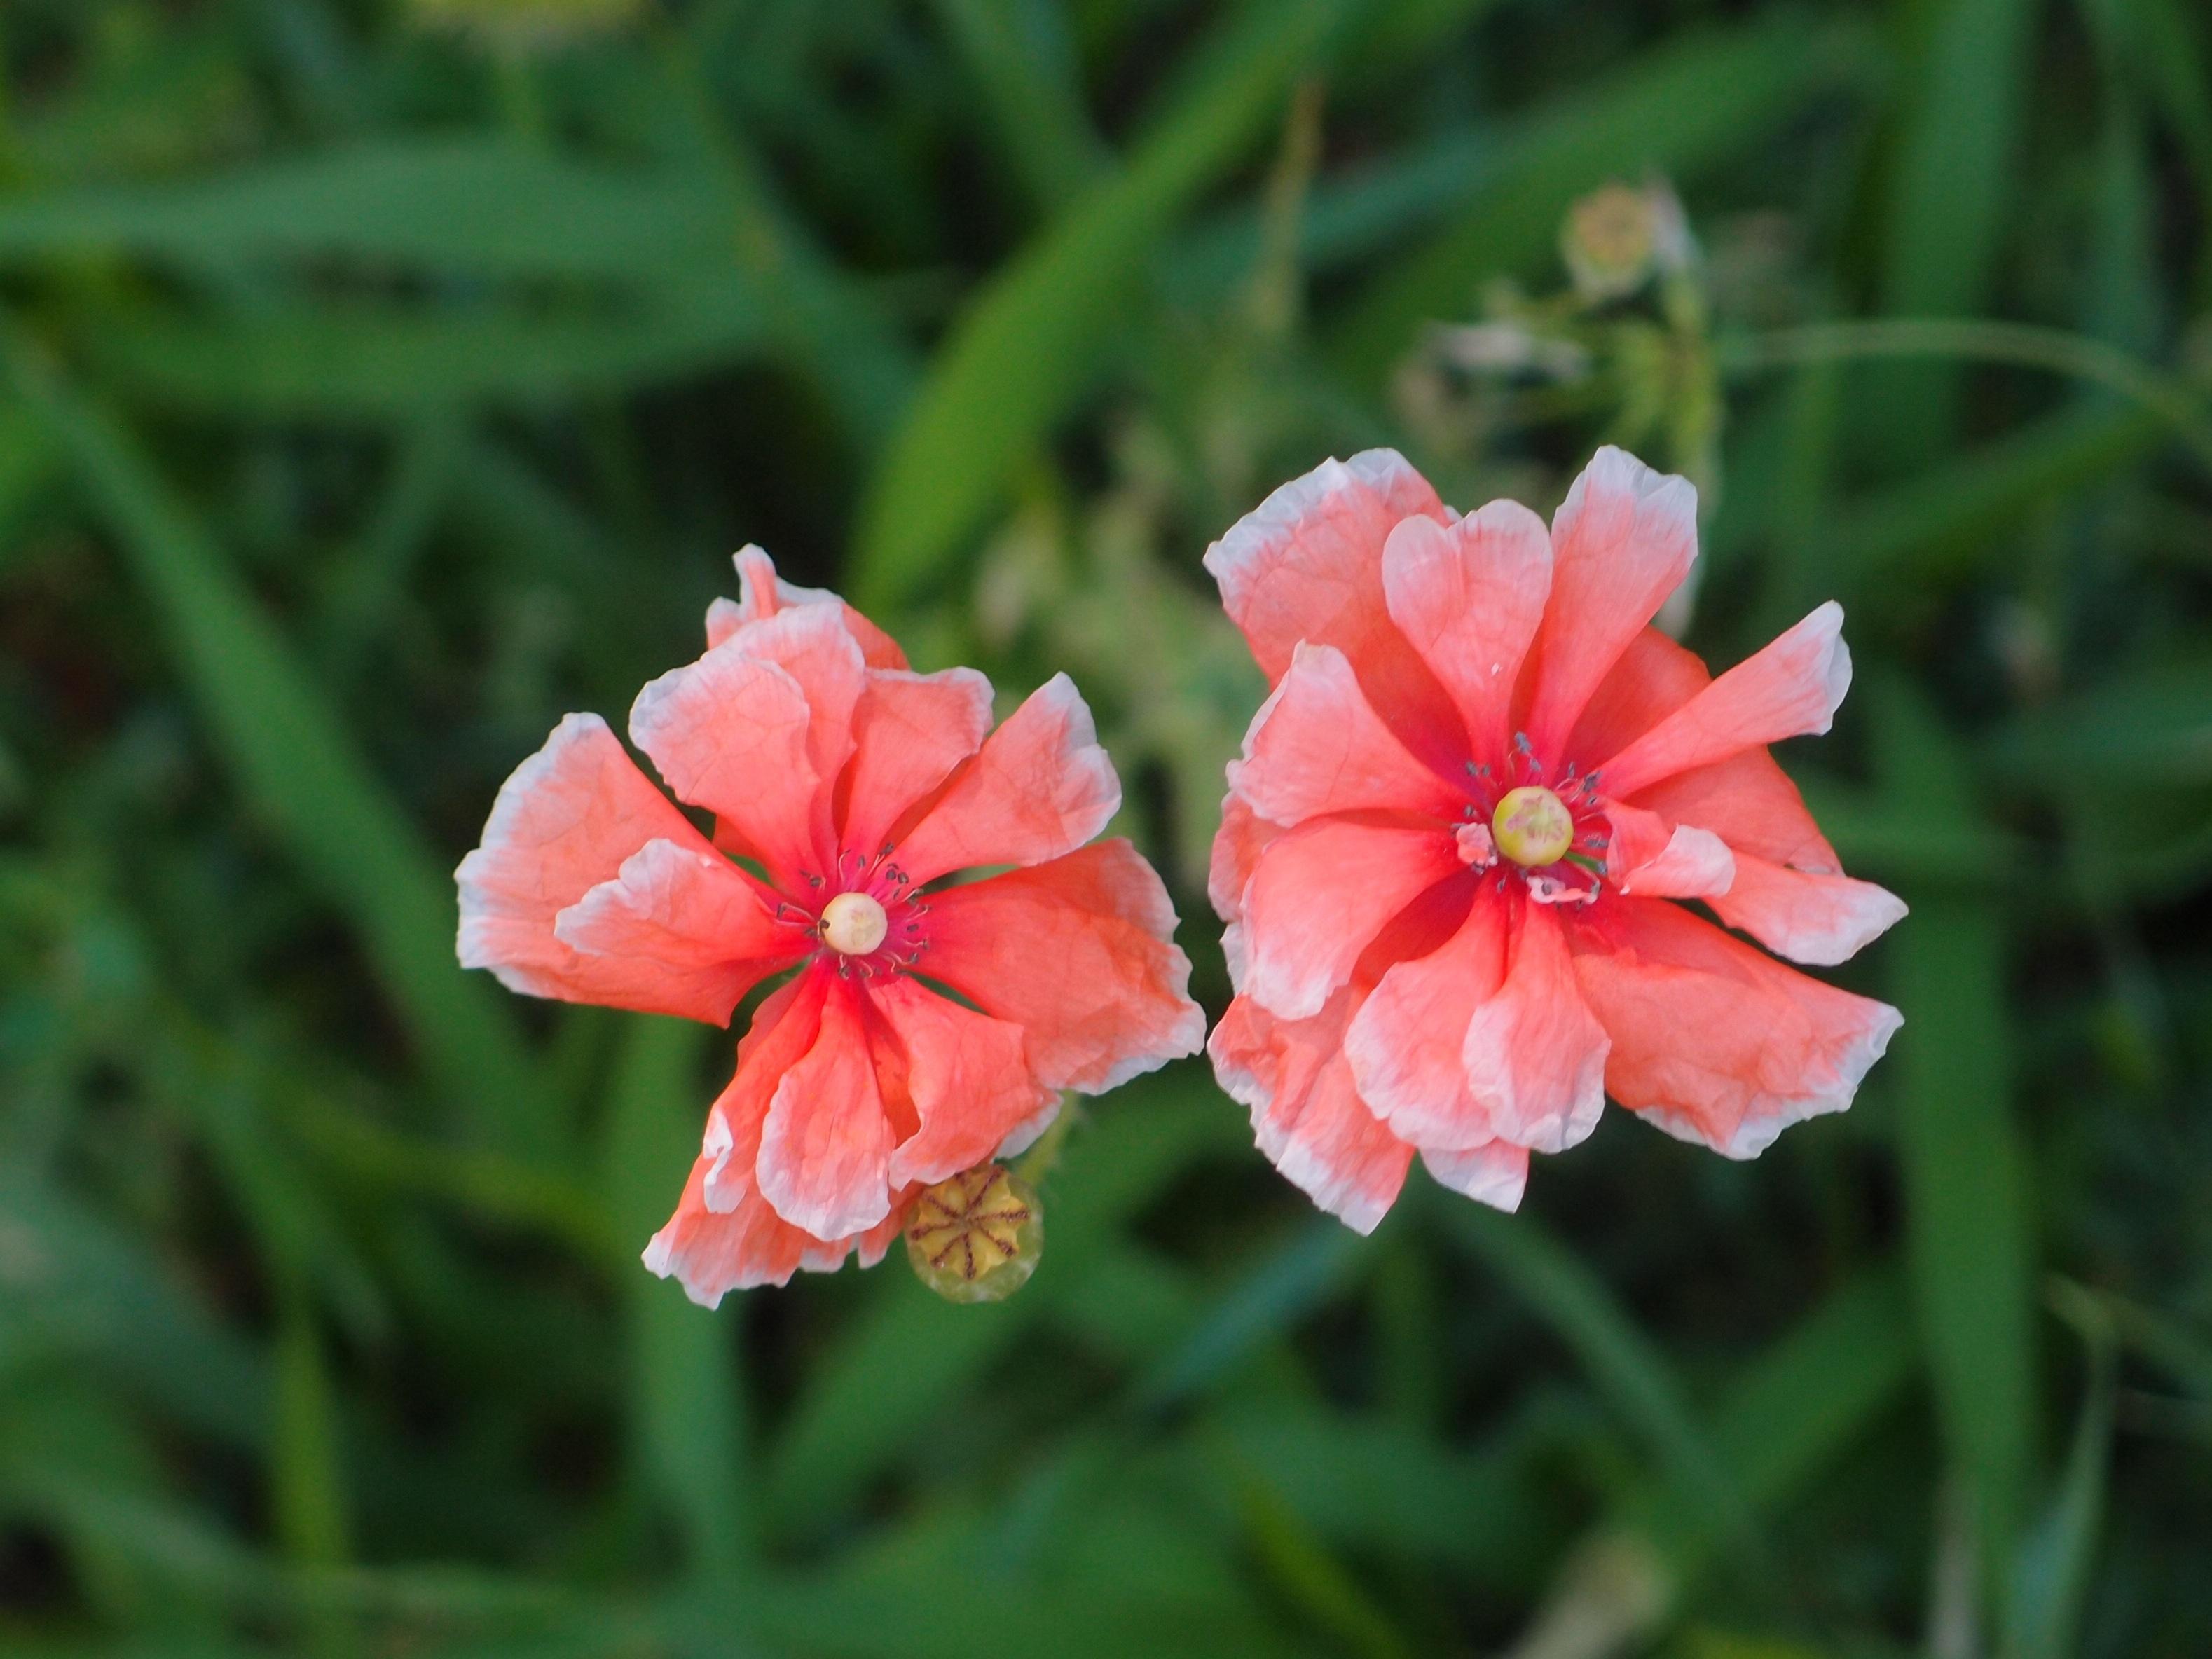 Free Images Petal Botany Closeup Flora Wildflower Red Flower